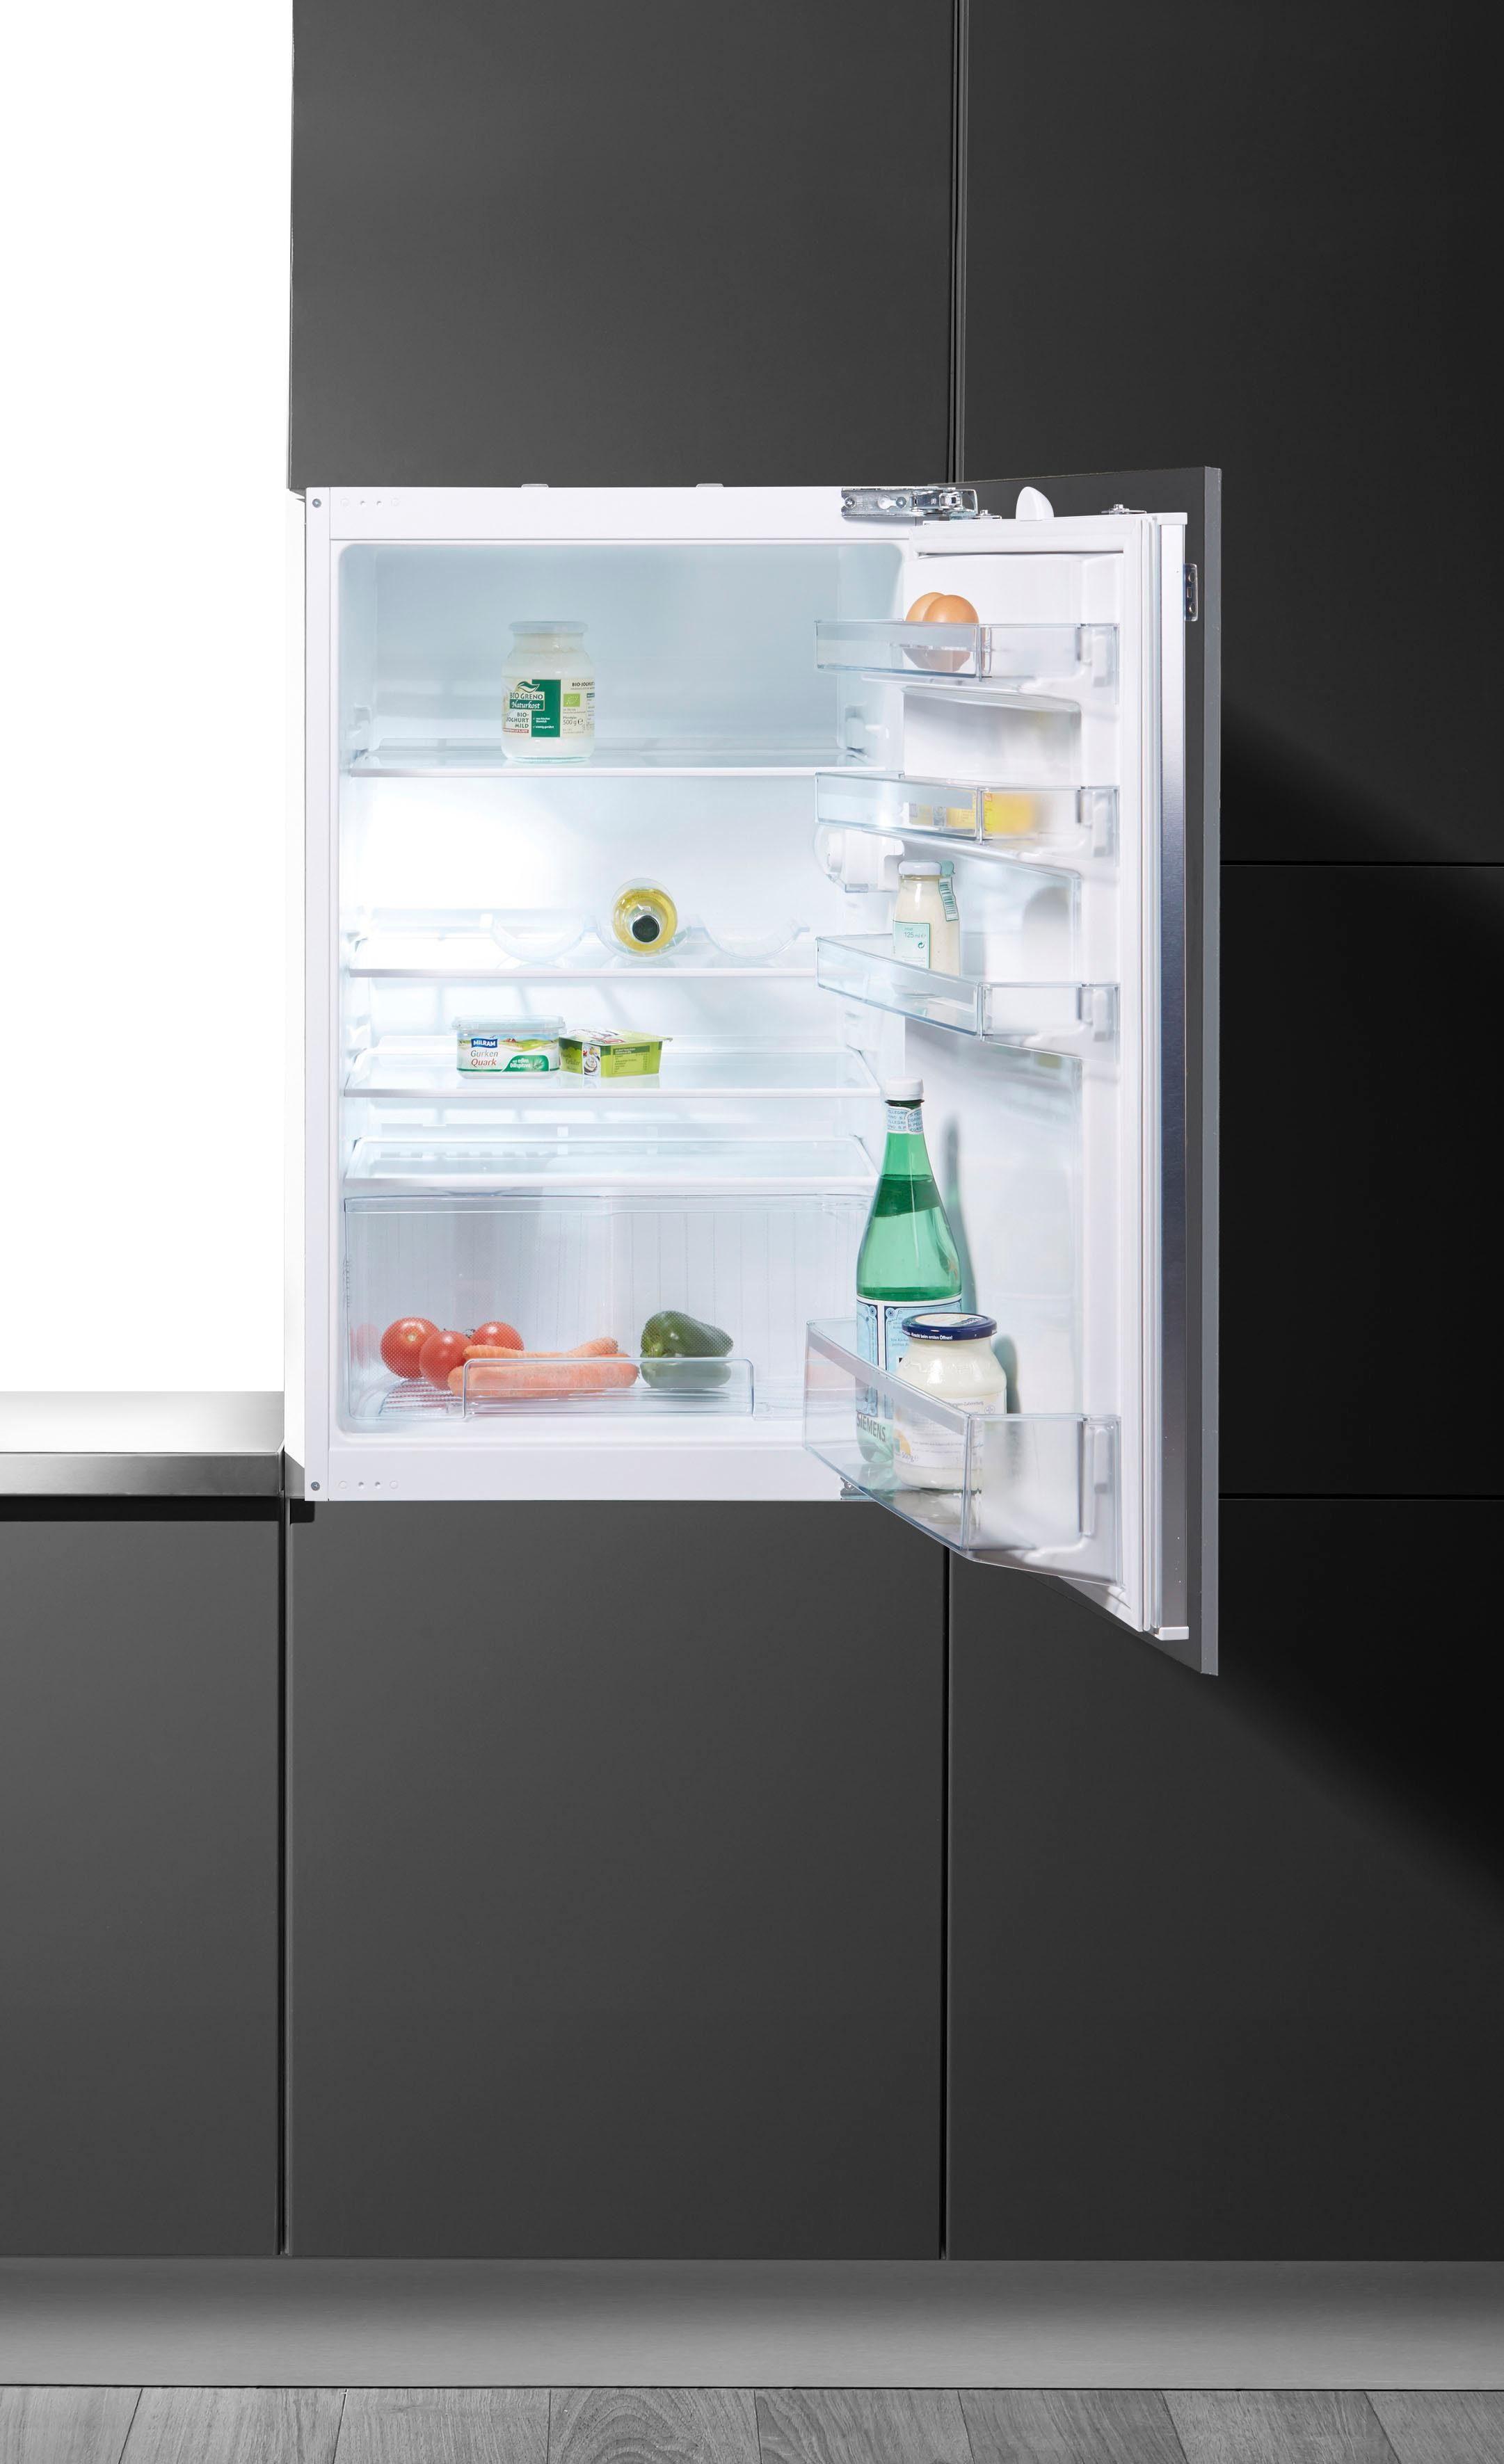 Siemens Einbau-Kühlschrank KI18RV62, Energieklasse A++, 87,4 cm hoch